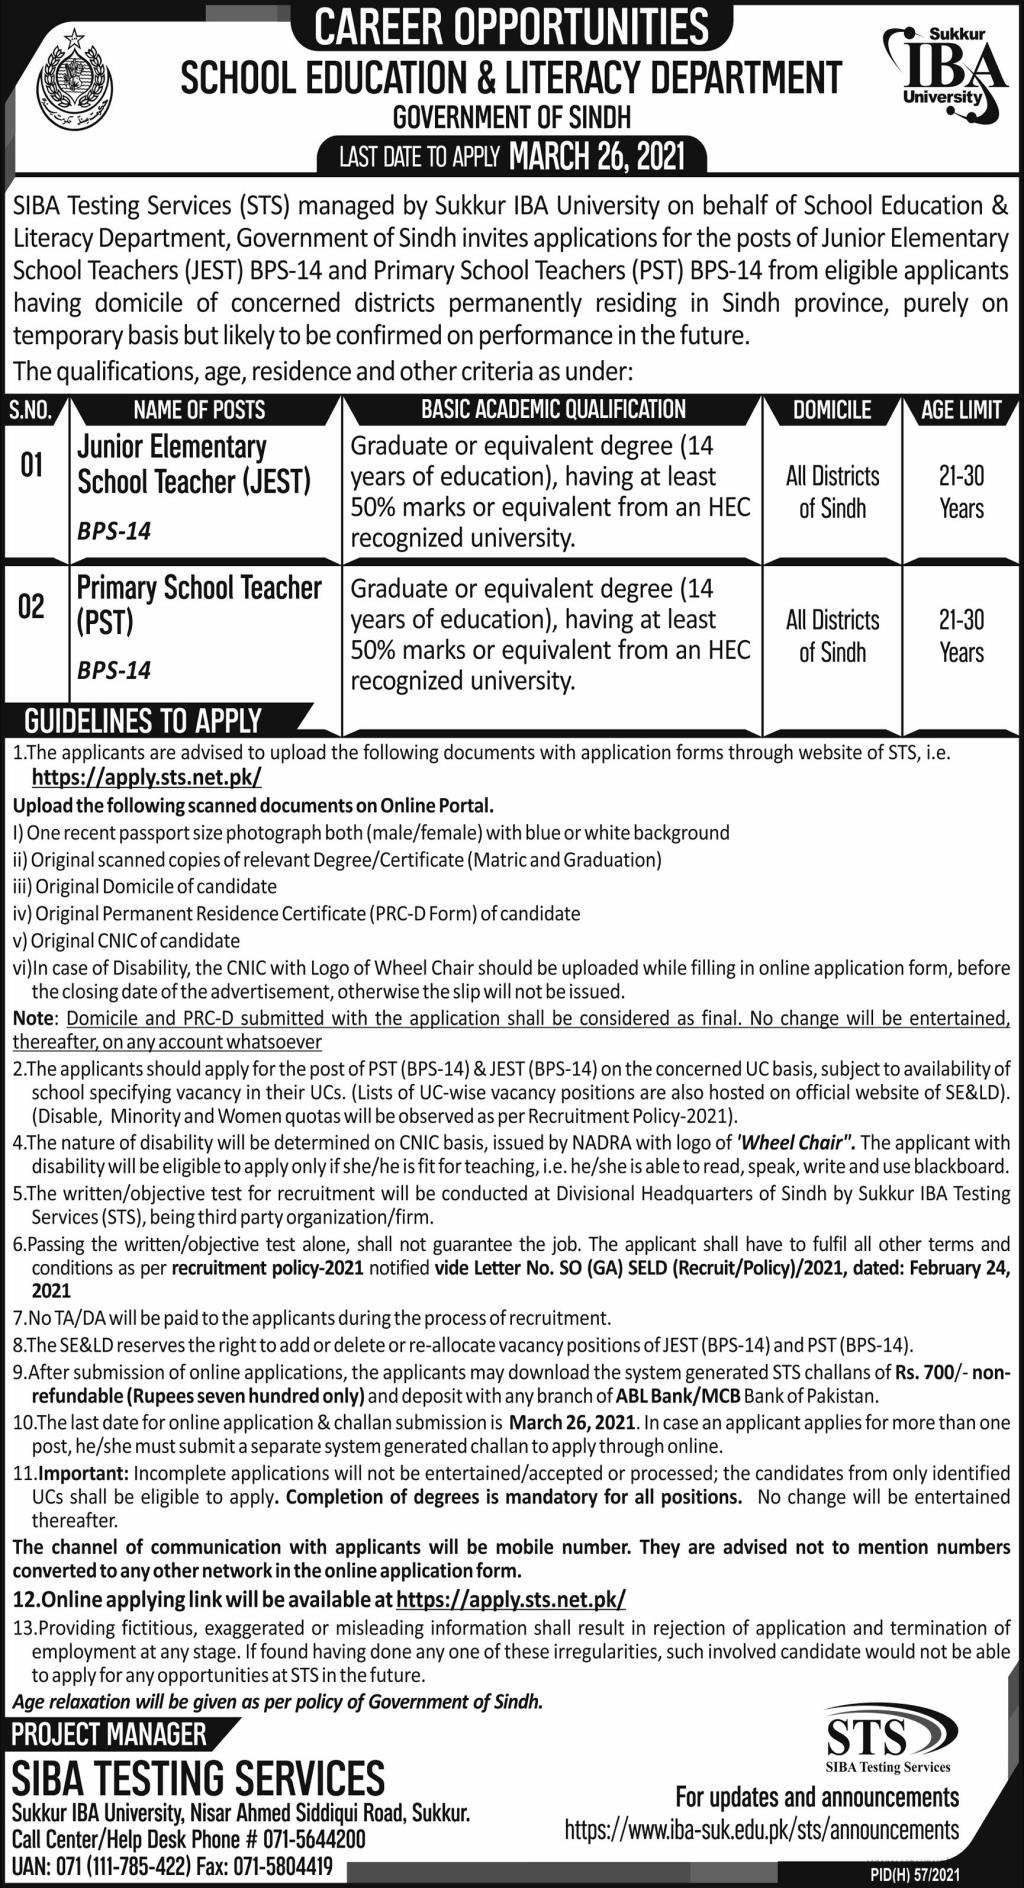 School Education & Literacy Department Jobs 2021 - Junior Elementary School Teacher Jobs 2021 - Primary School Teacher Jobs 2021 - Download SIBA Testing Services STS Job Application Form :- http://www.biwrmdp.org.pk/career-opportunities/